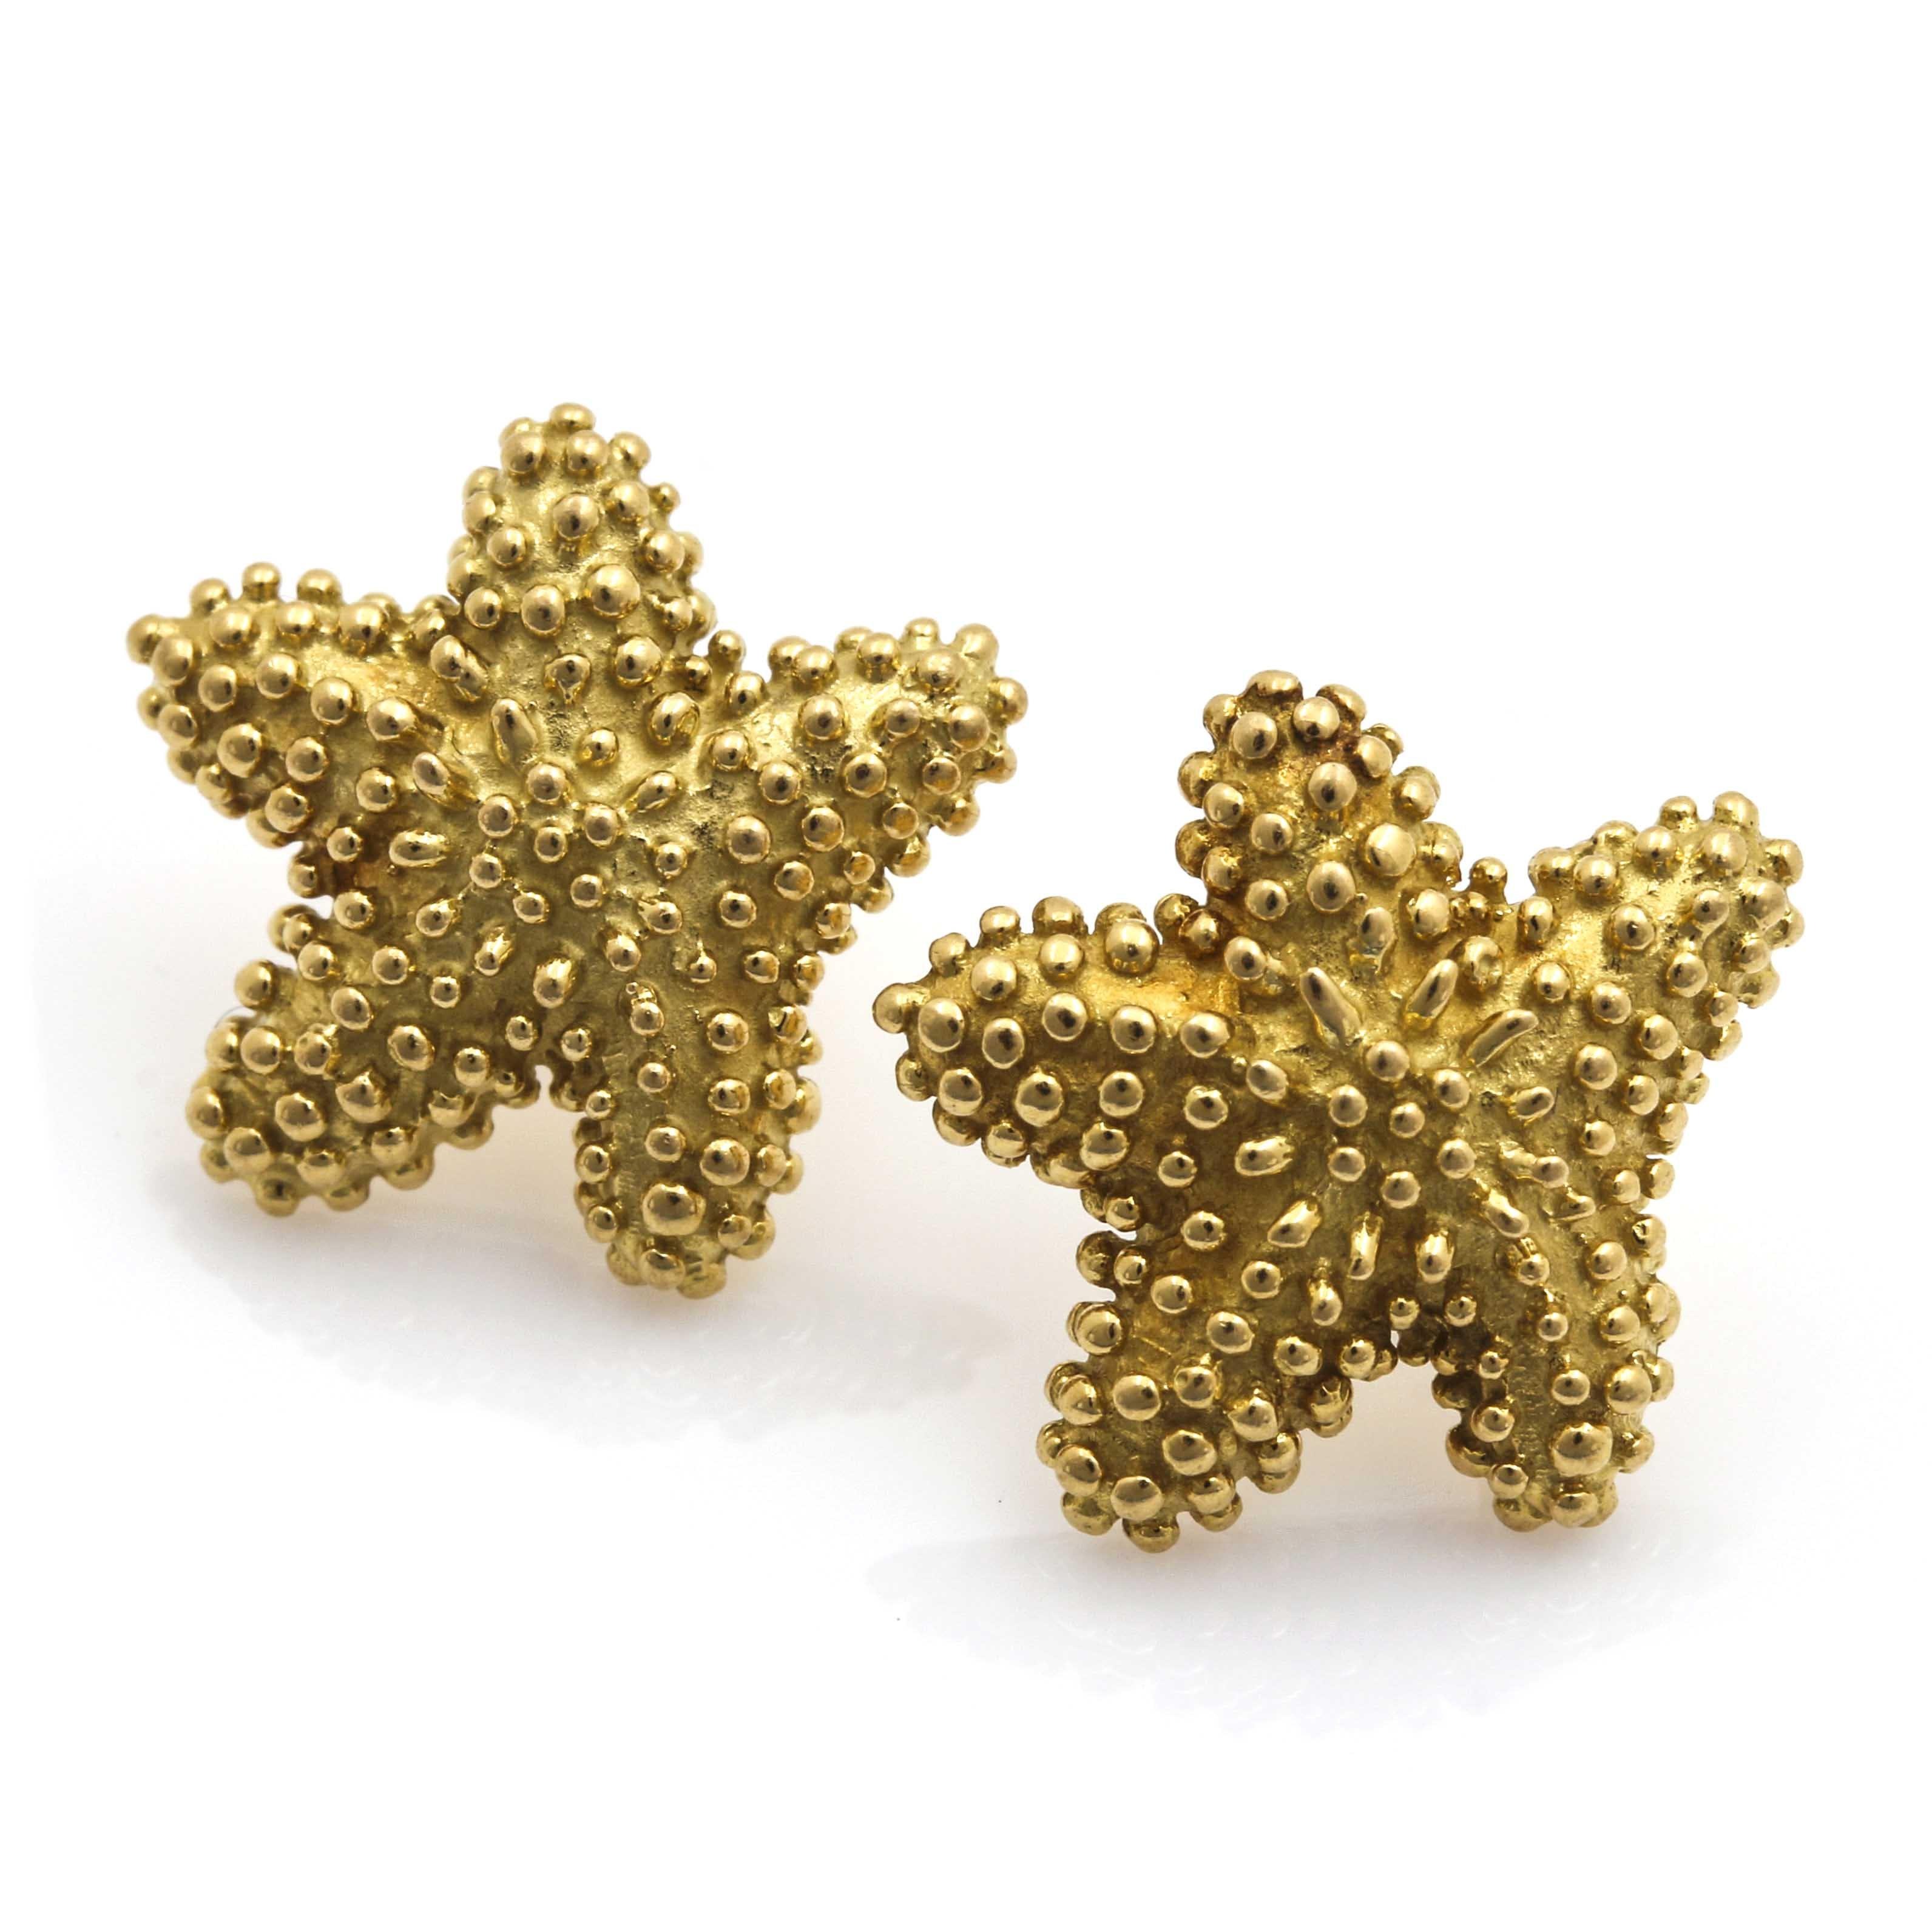 Tiffany & Co. 18K Yellow Gold Starfish Stud Earrings